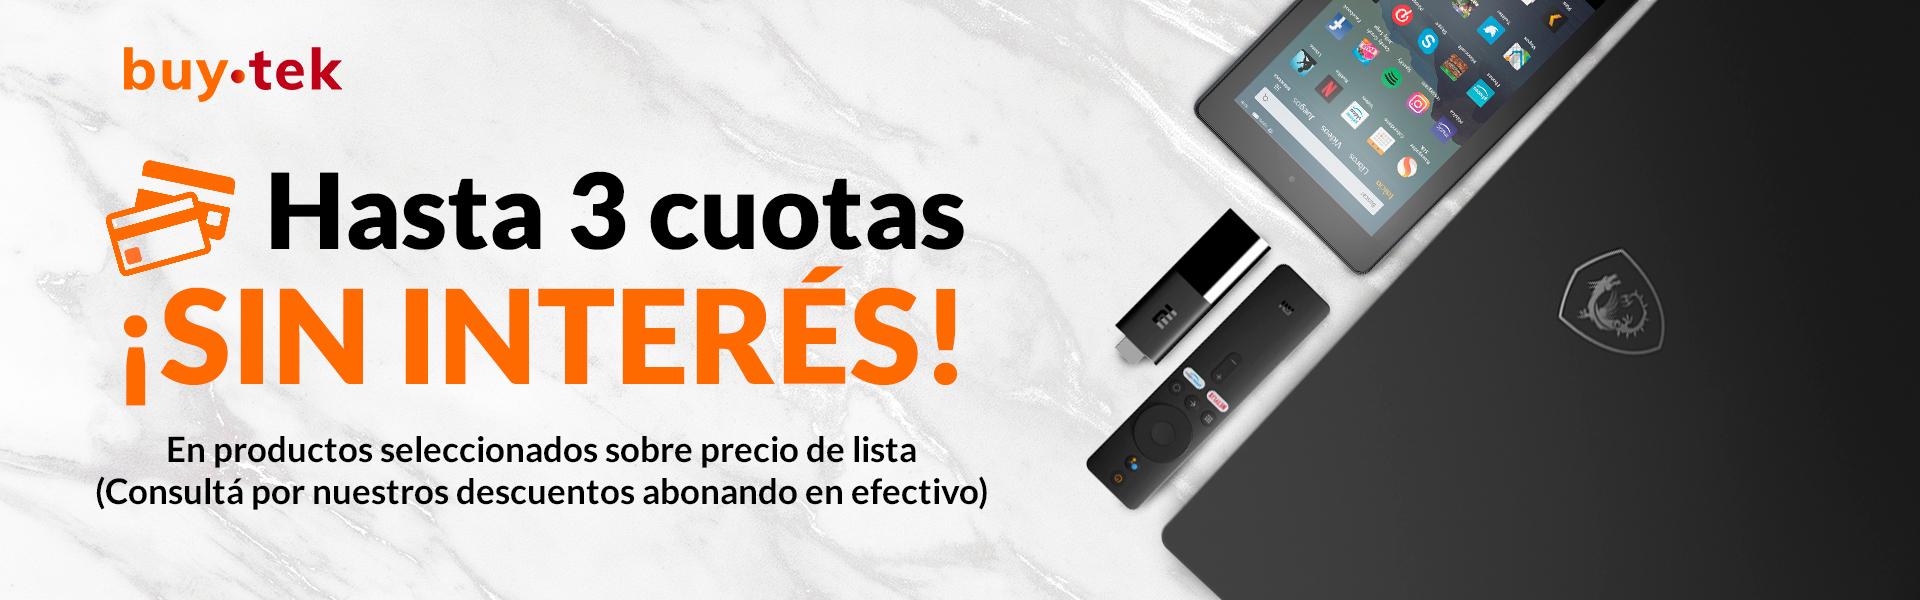 cuotas - Desktop 10.21